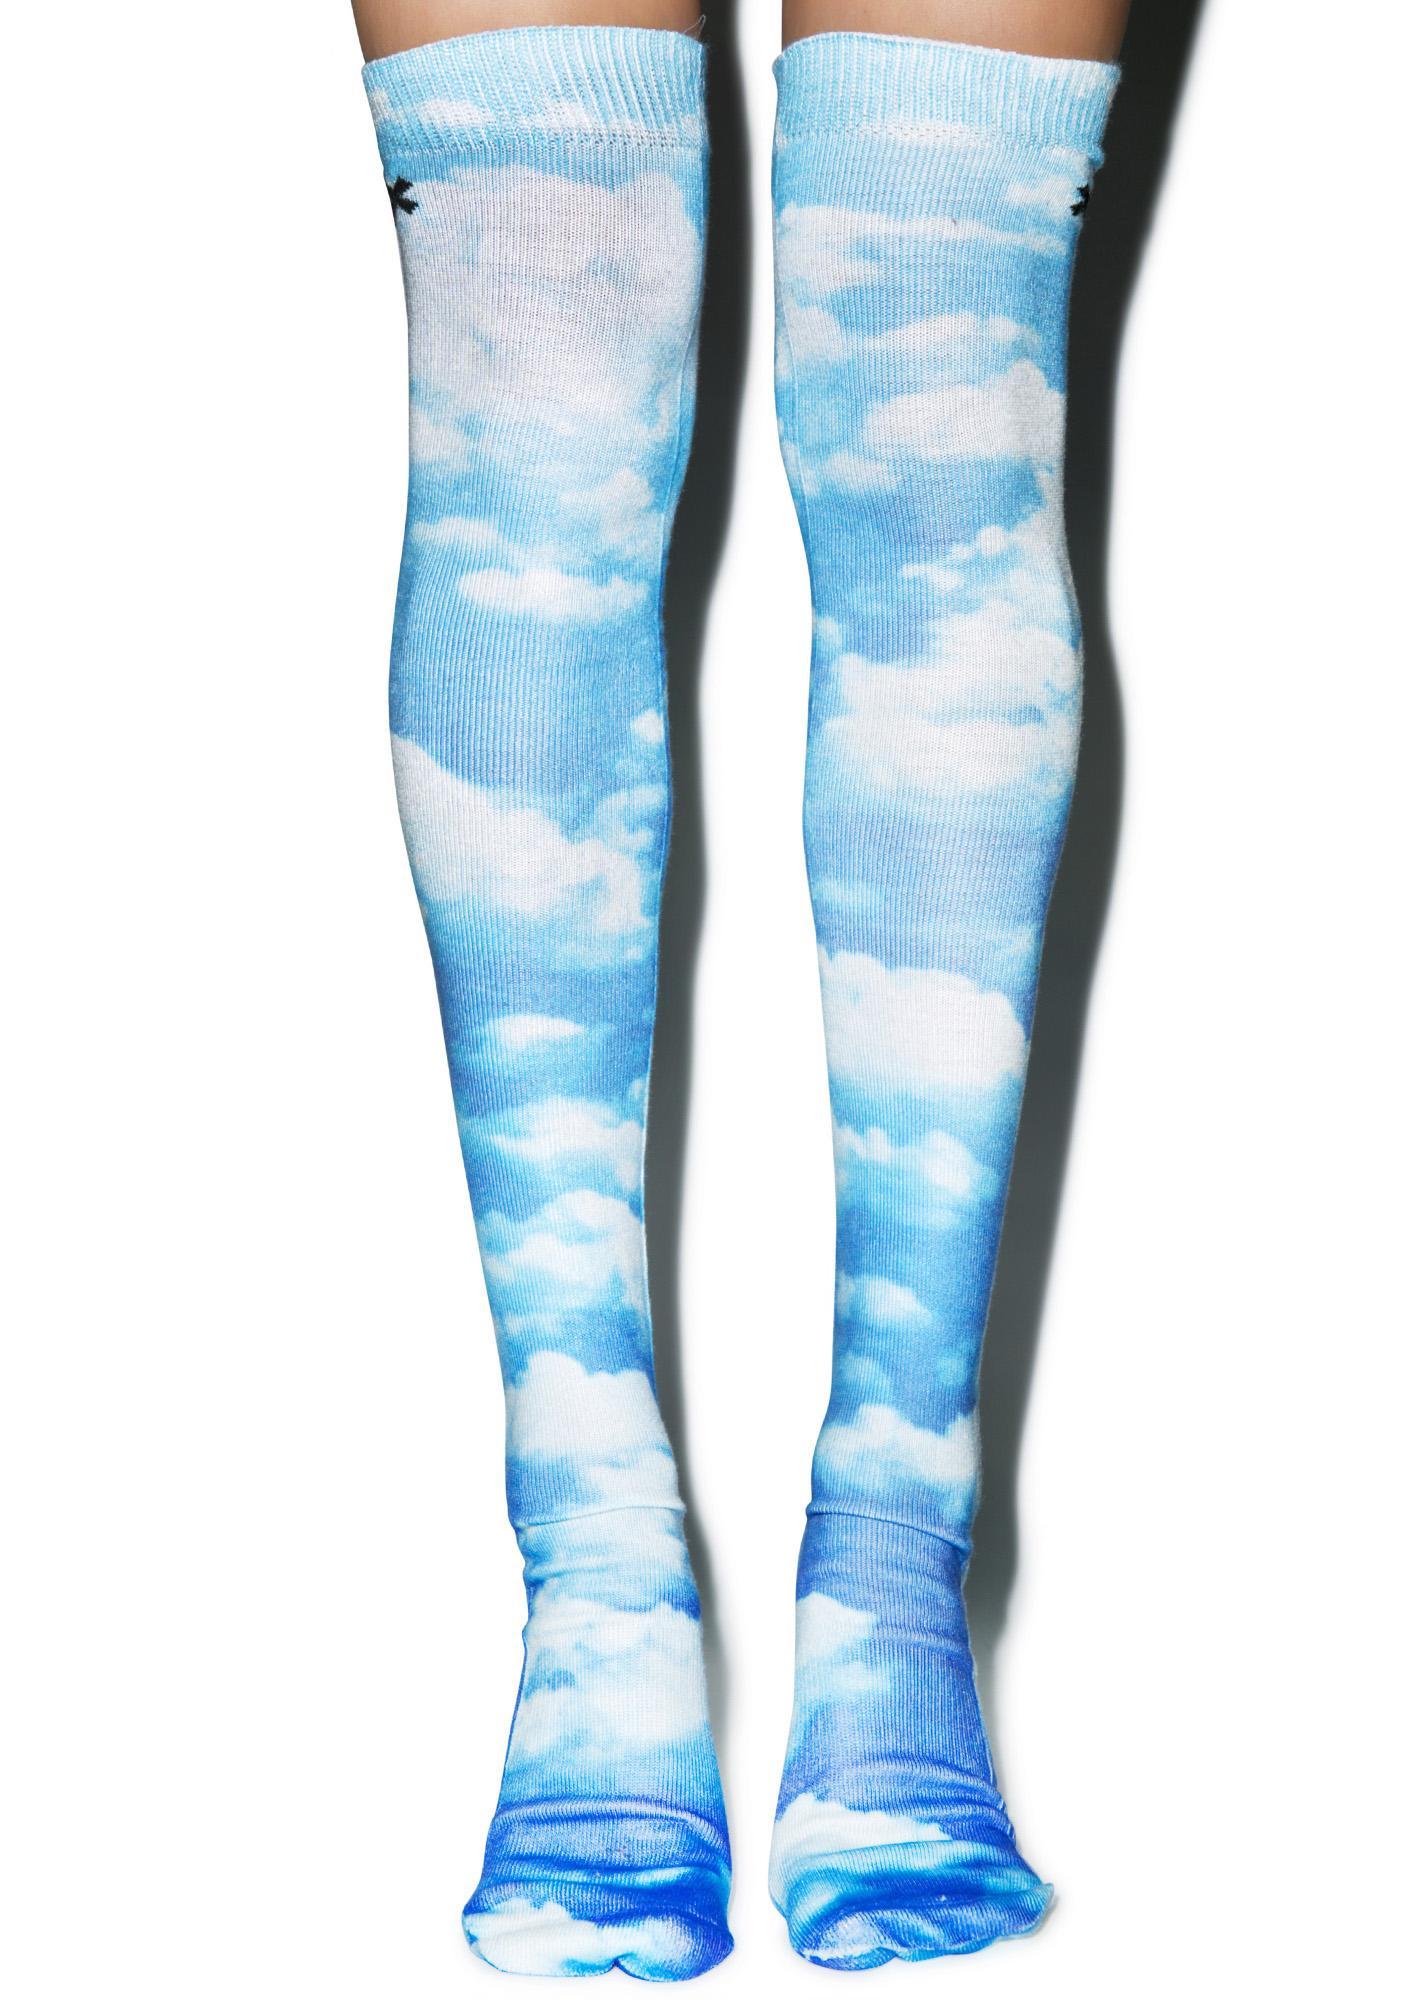 Odd Sox Sky High Knee High Socks